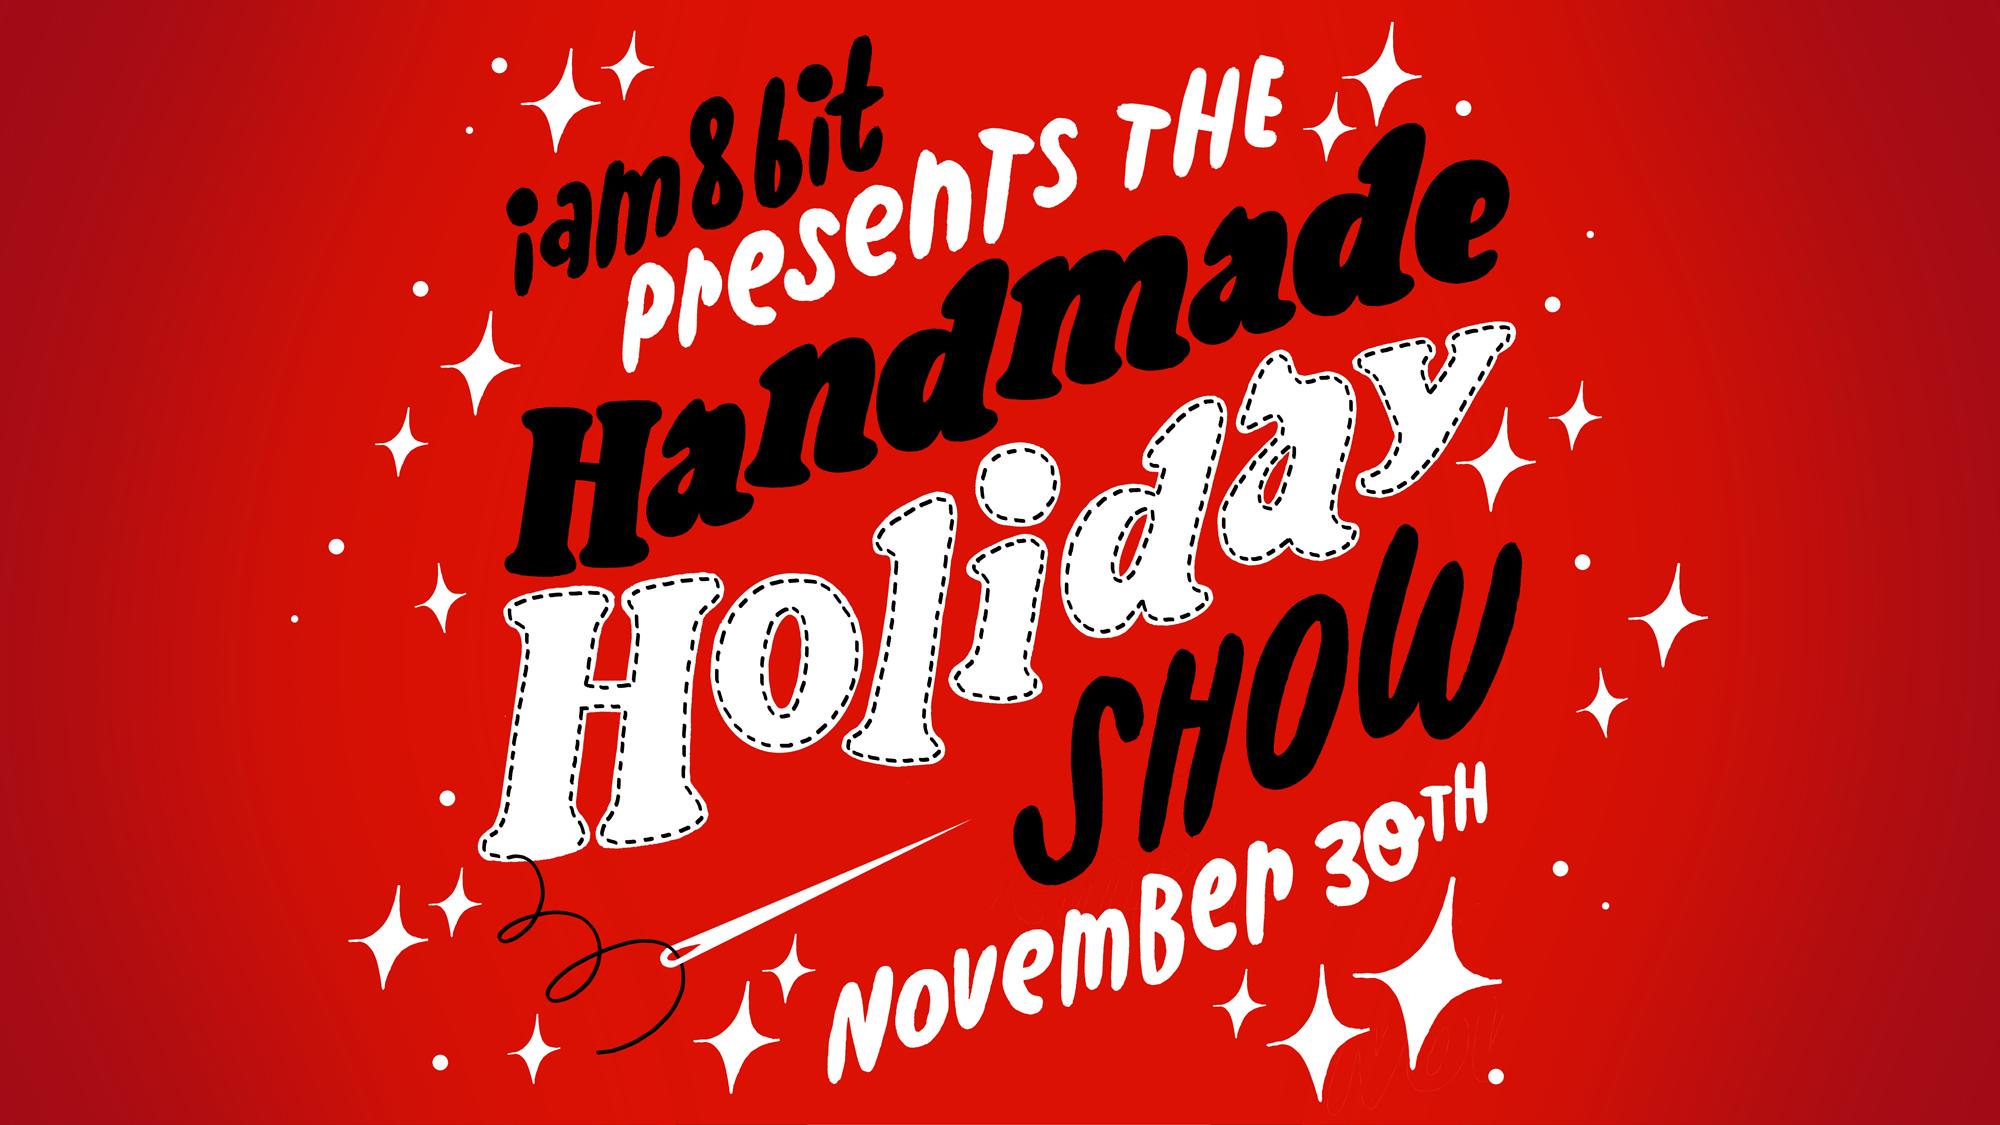 iam8bit – The Handmade Holiday Show – Calling All Californians!